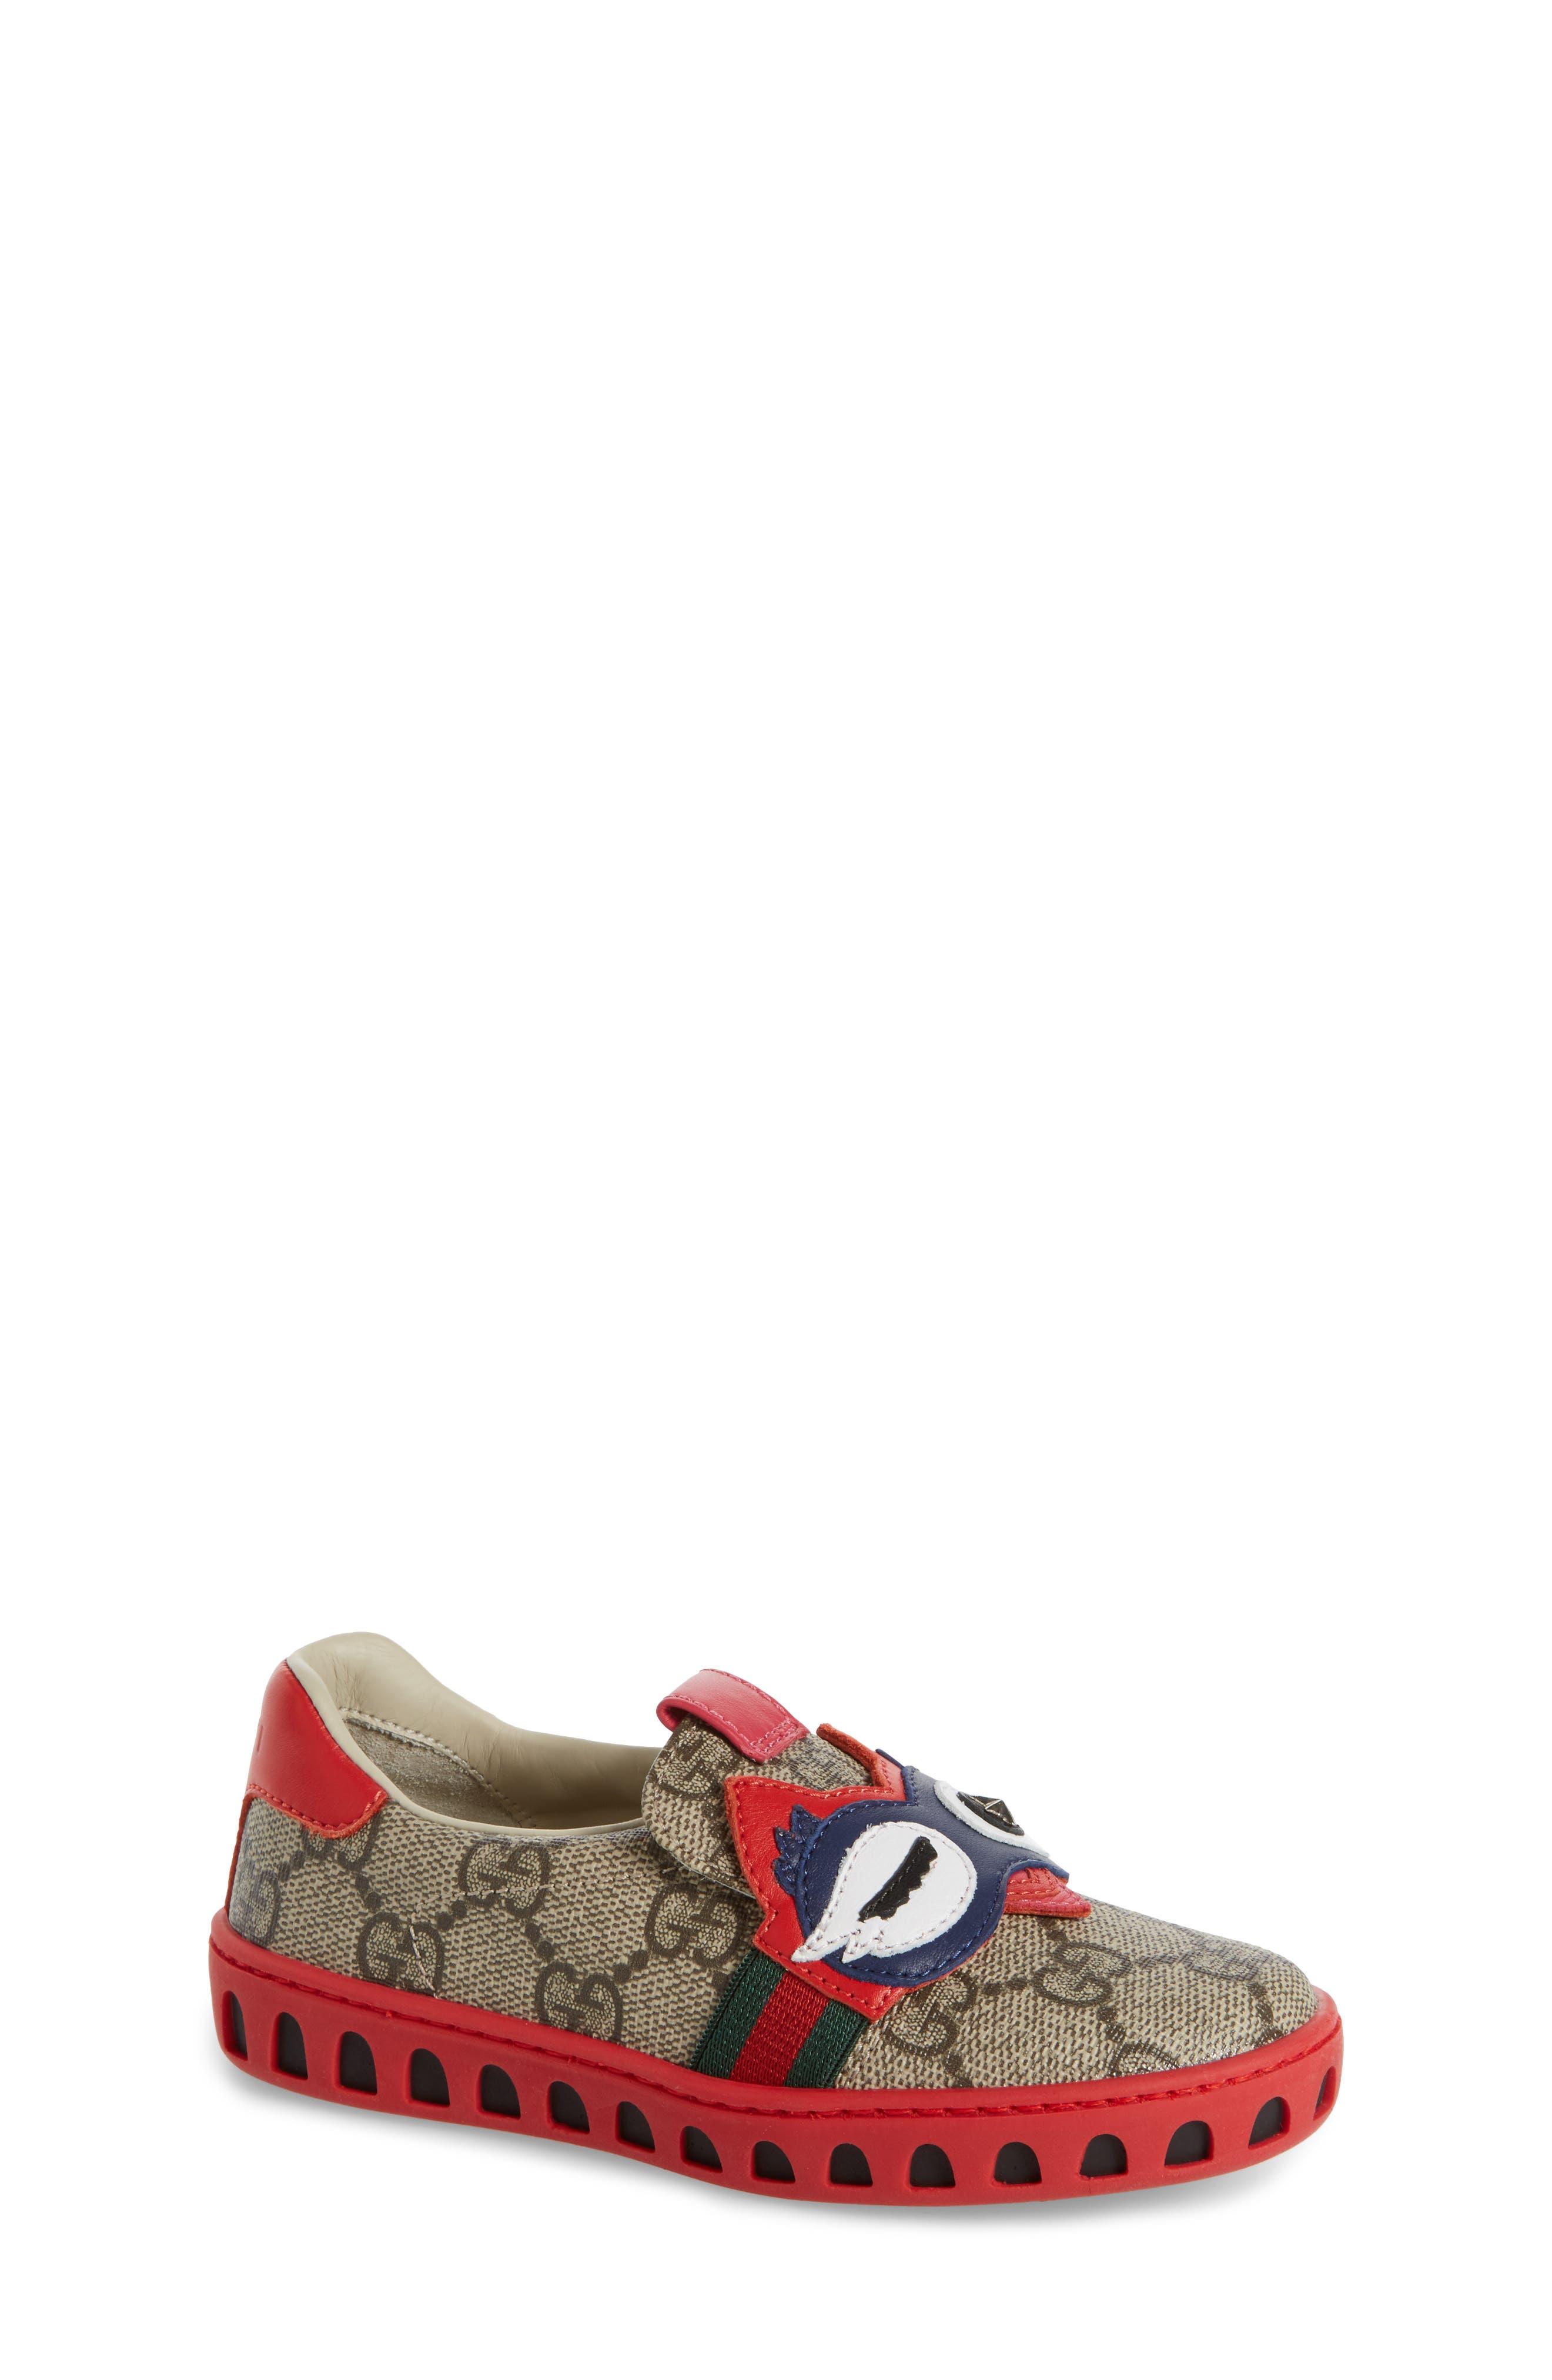 Gucci GG Supreme Slip-On Owl Sneaker (Toddler)